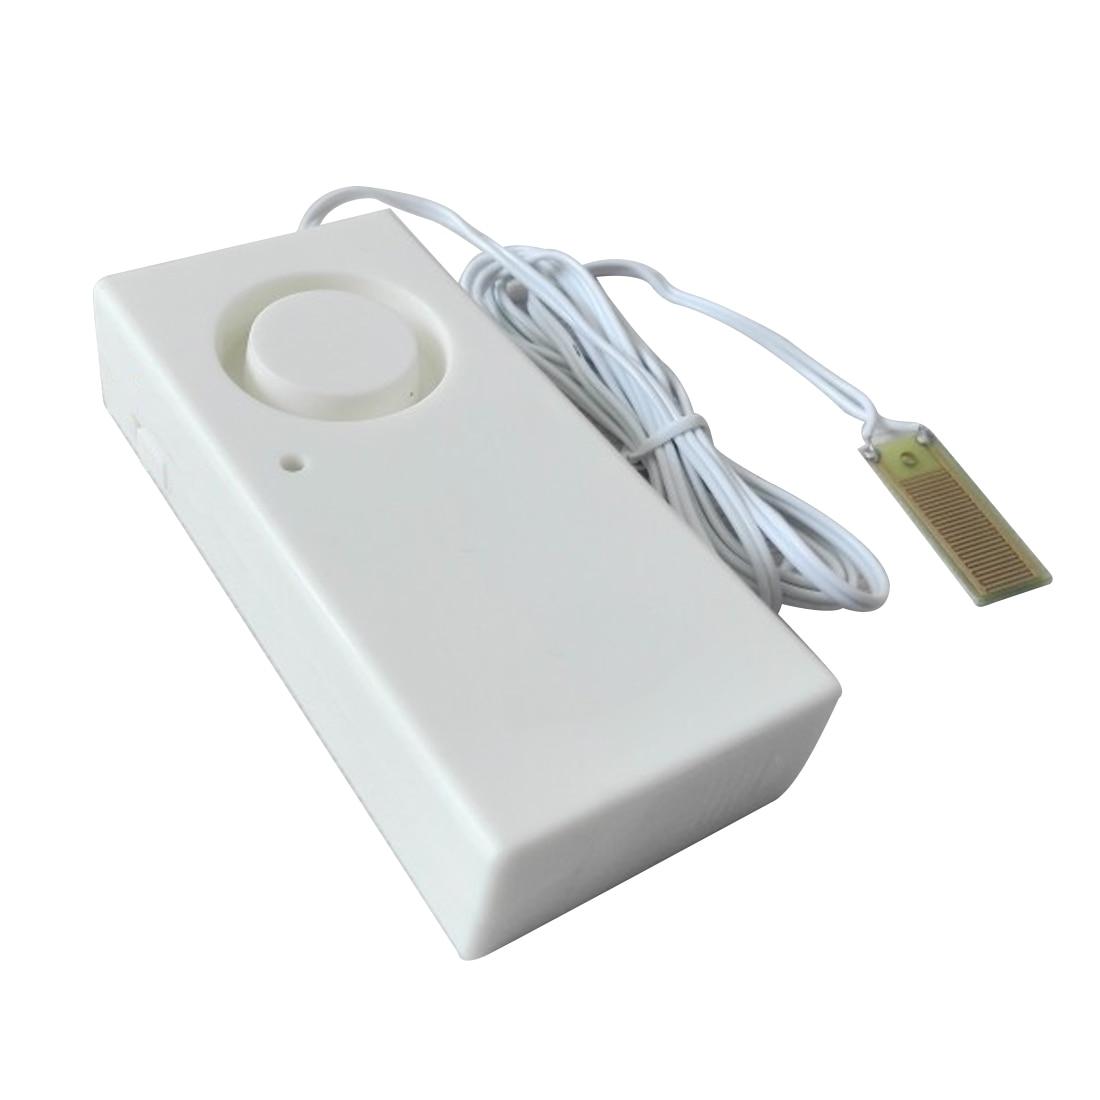 Neue Wasser Leck Alarm Flut Ebene Überlauf Detektor Sensor Alarm Home Security Alarm Leckage Alarm Detektor